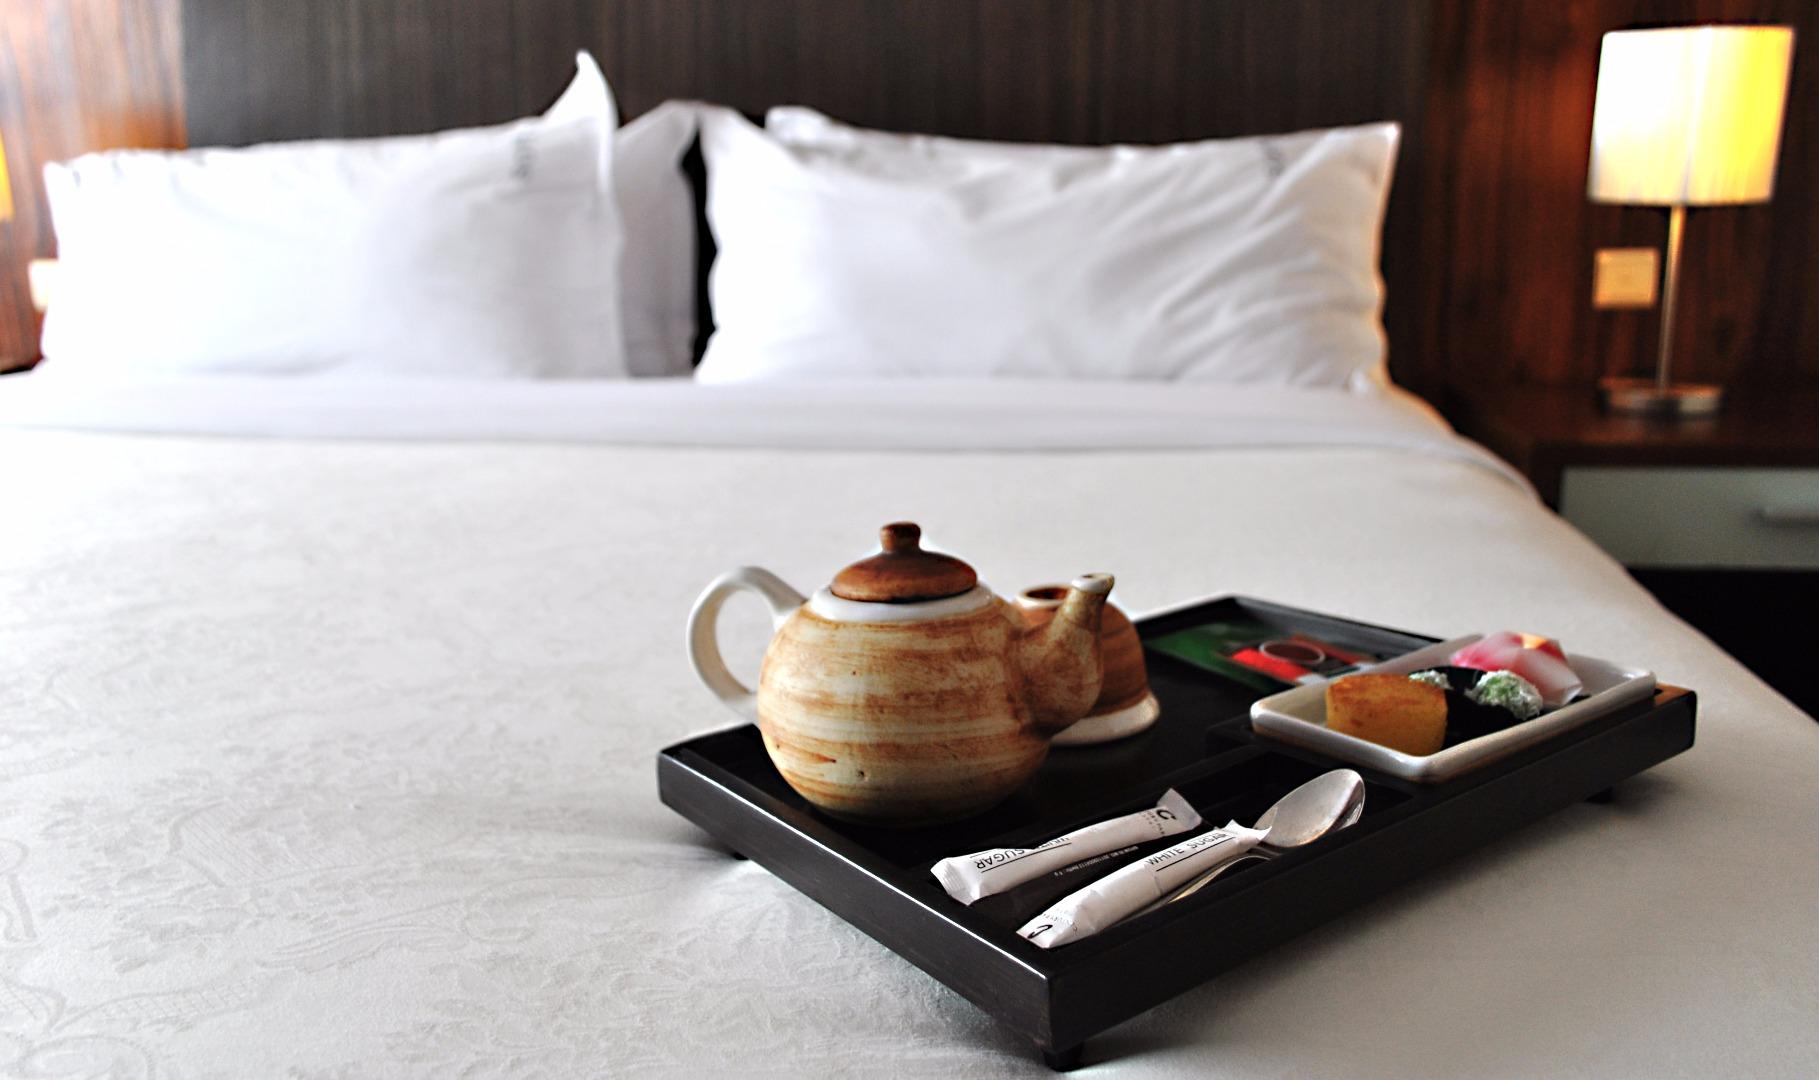 Century park hotel in jakarta   book a luxury business hotel near ...